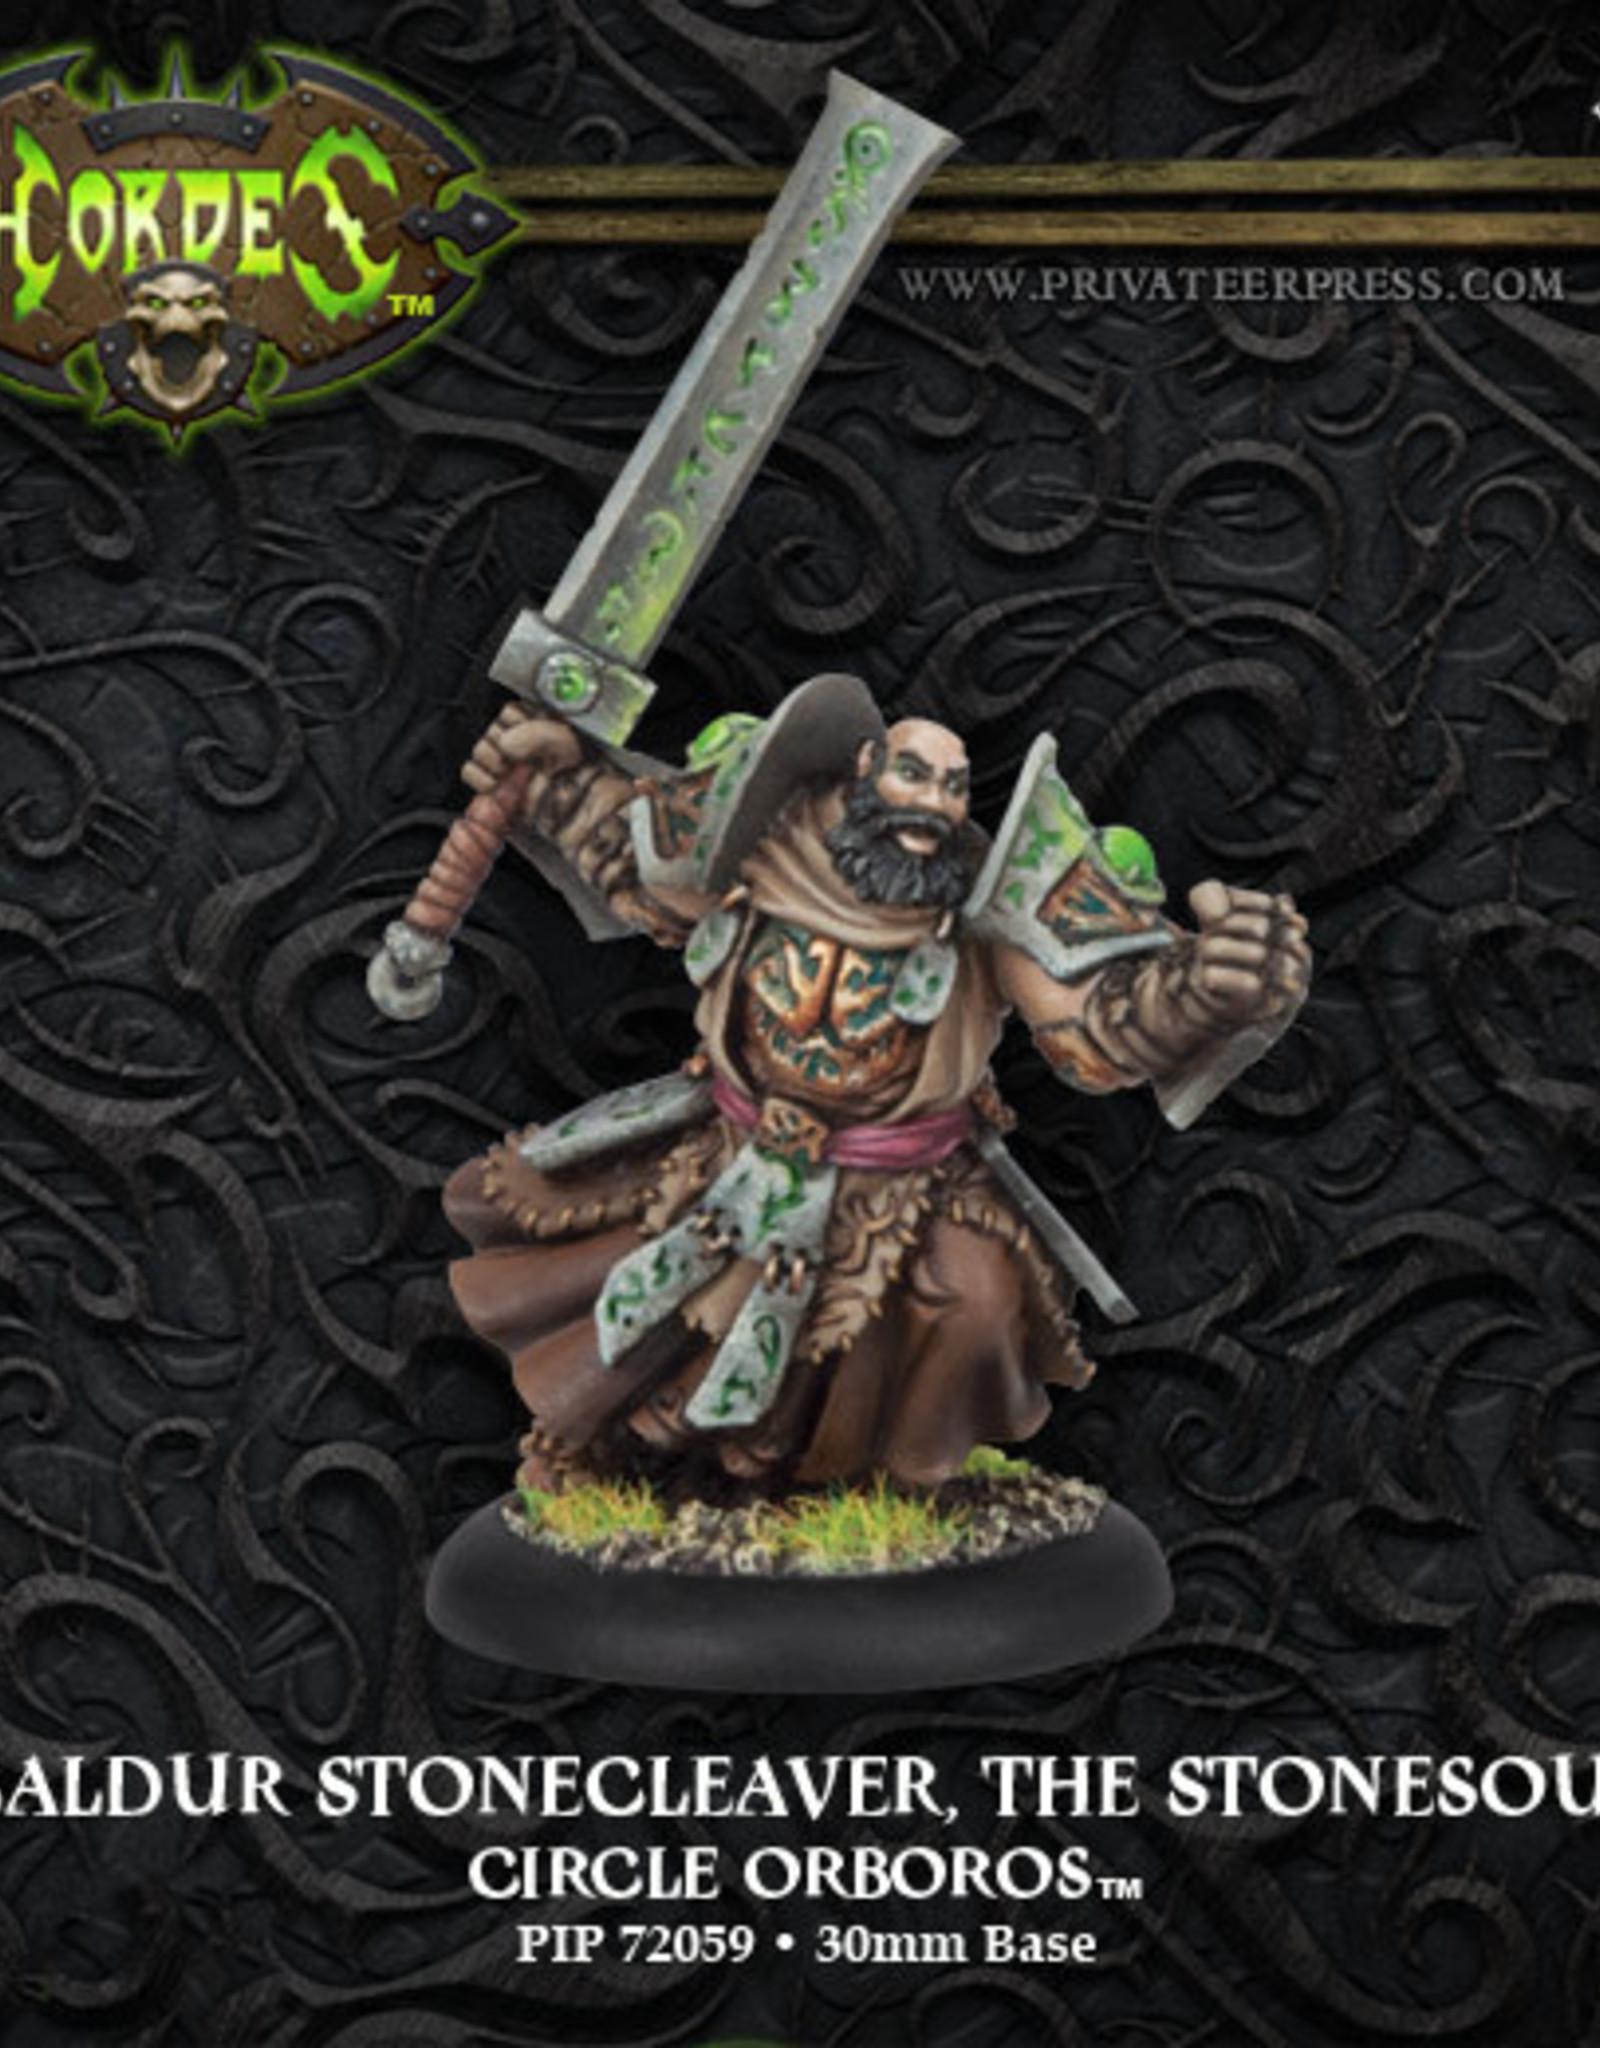 Hordes Circle - Baldur Stonecleaver the Stonesoul